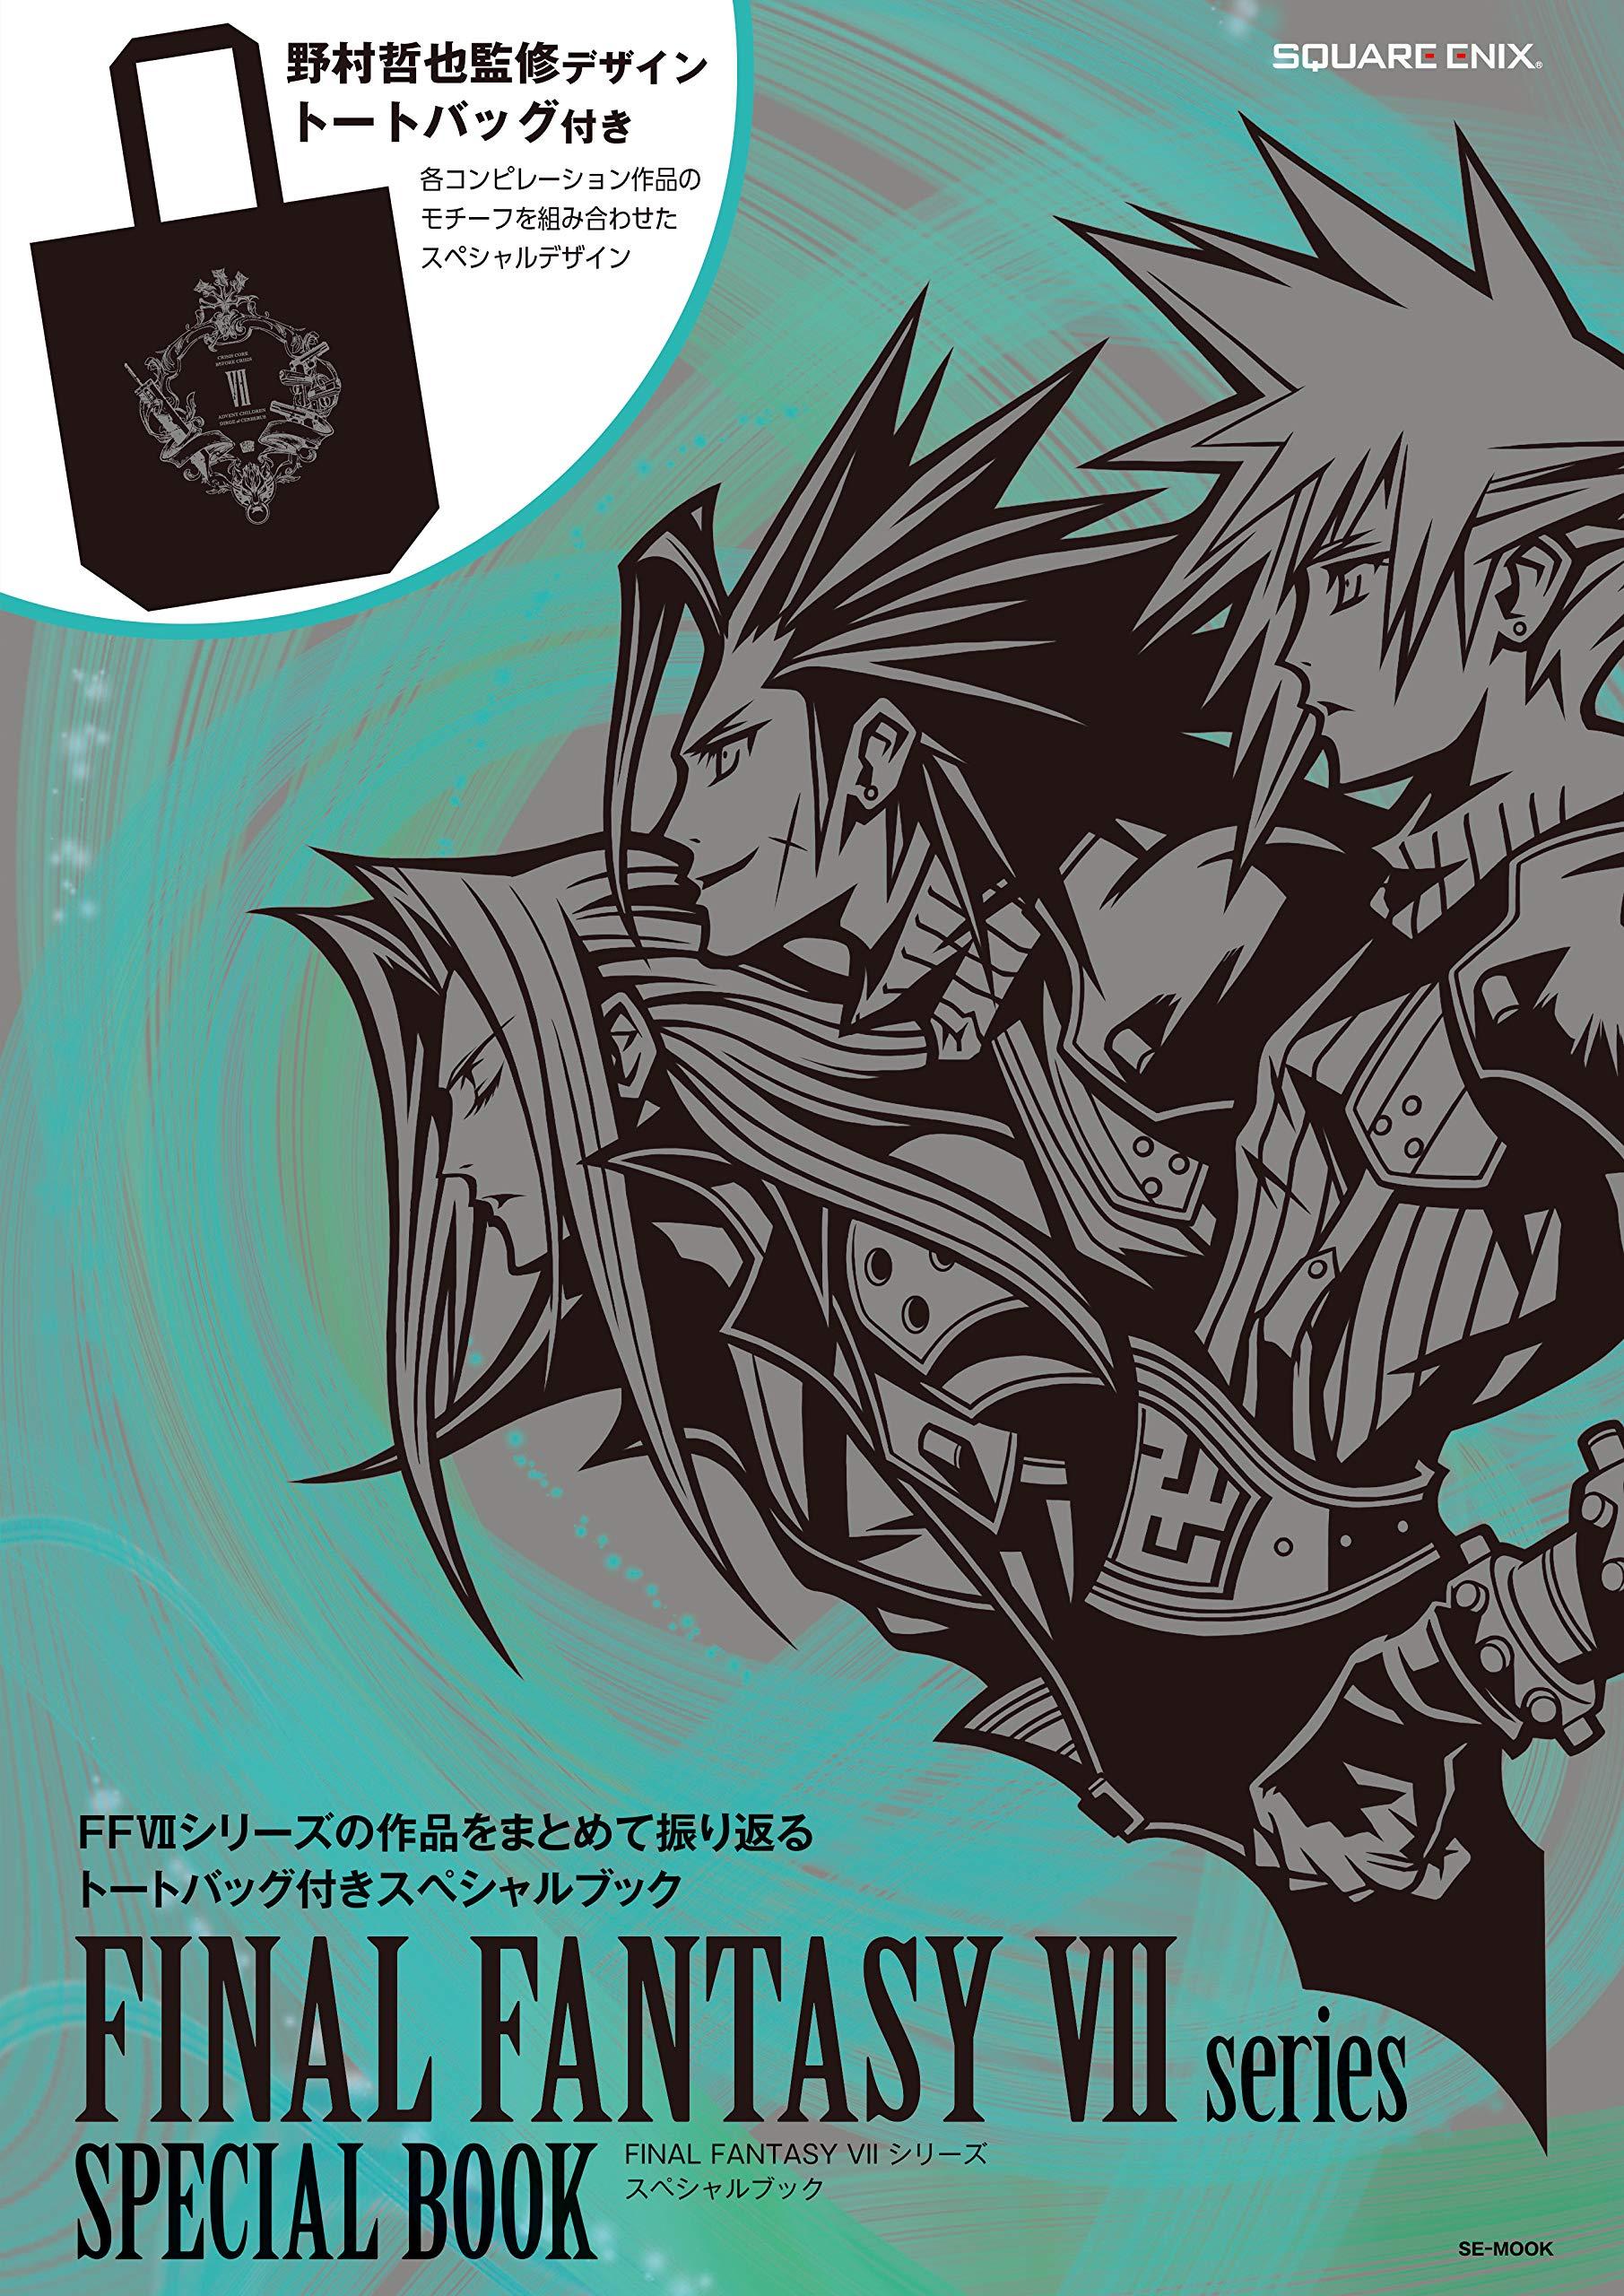 Final Fantasy VII series Special Book